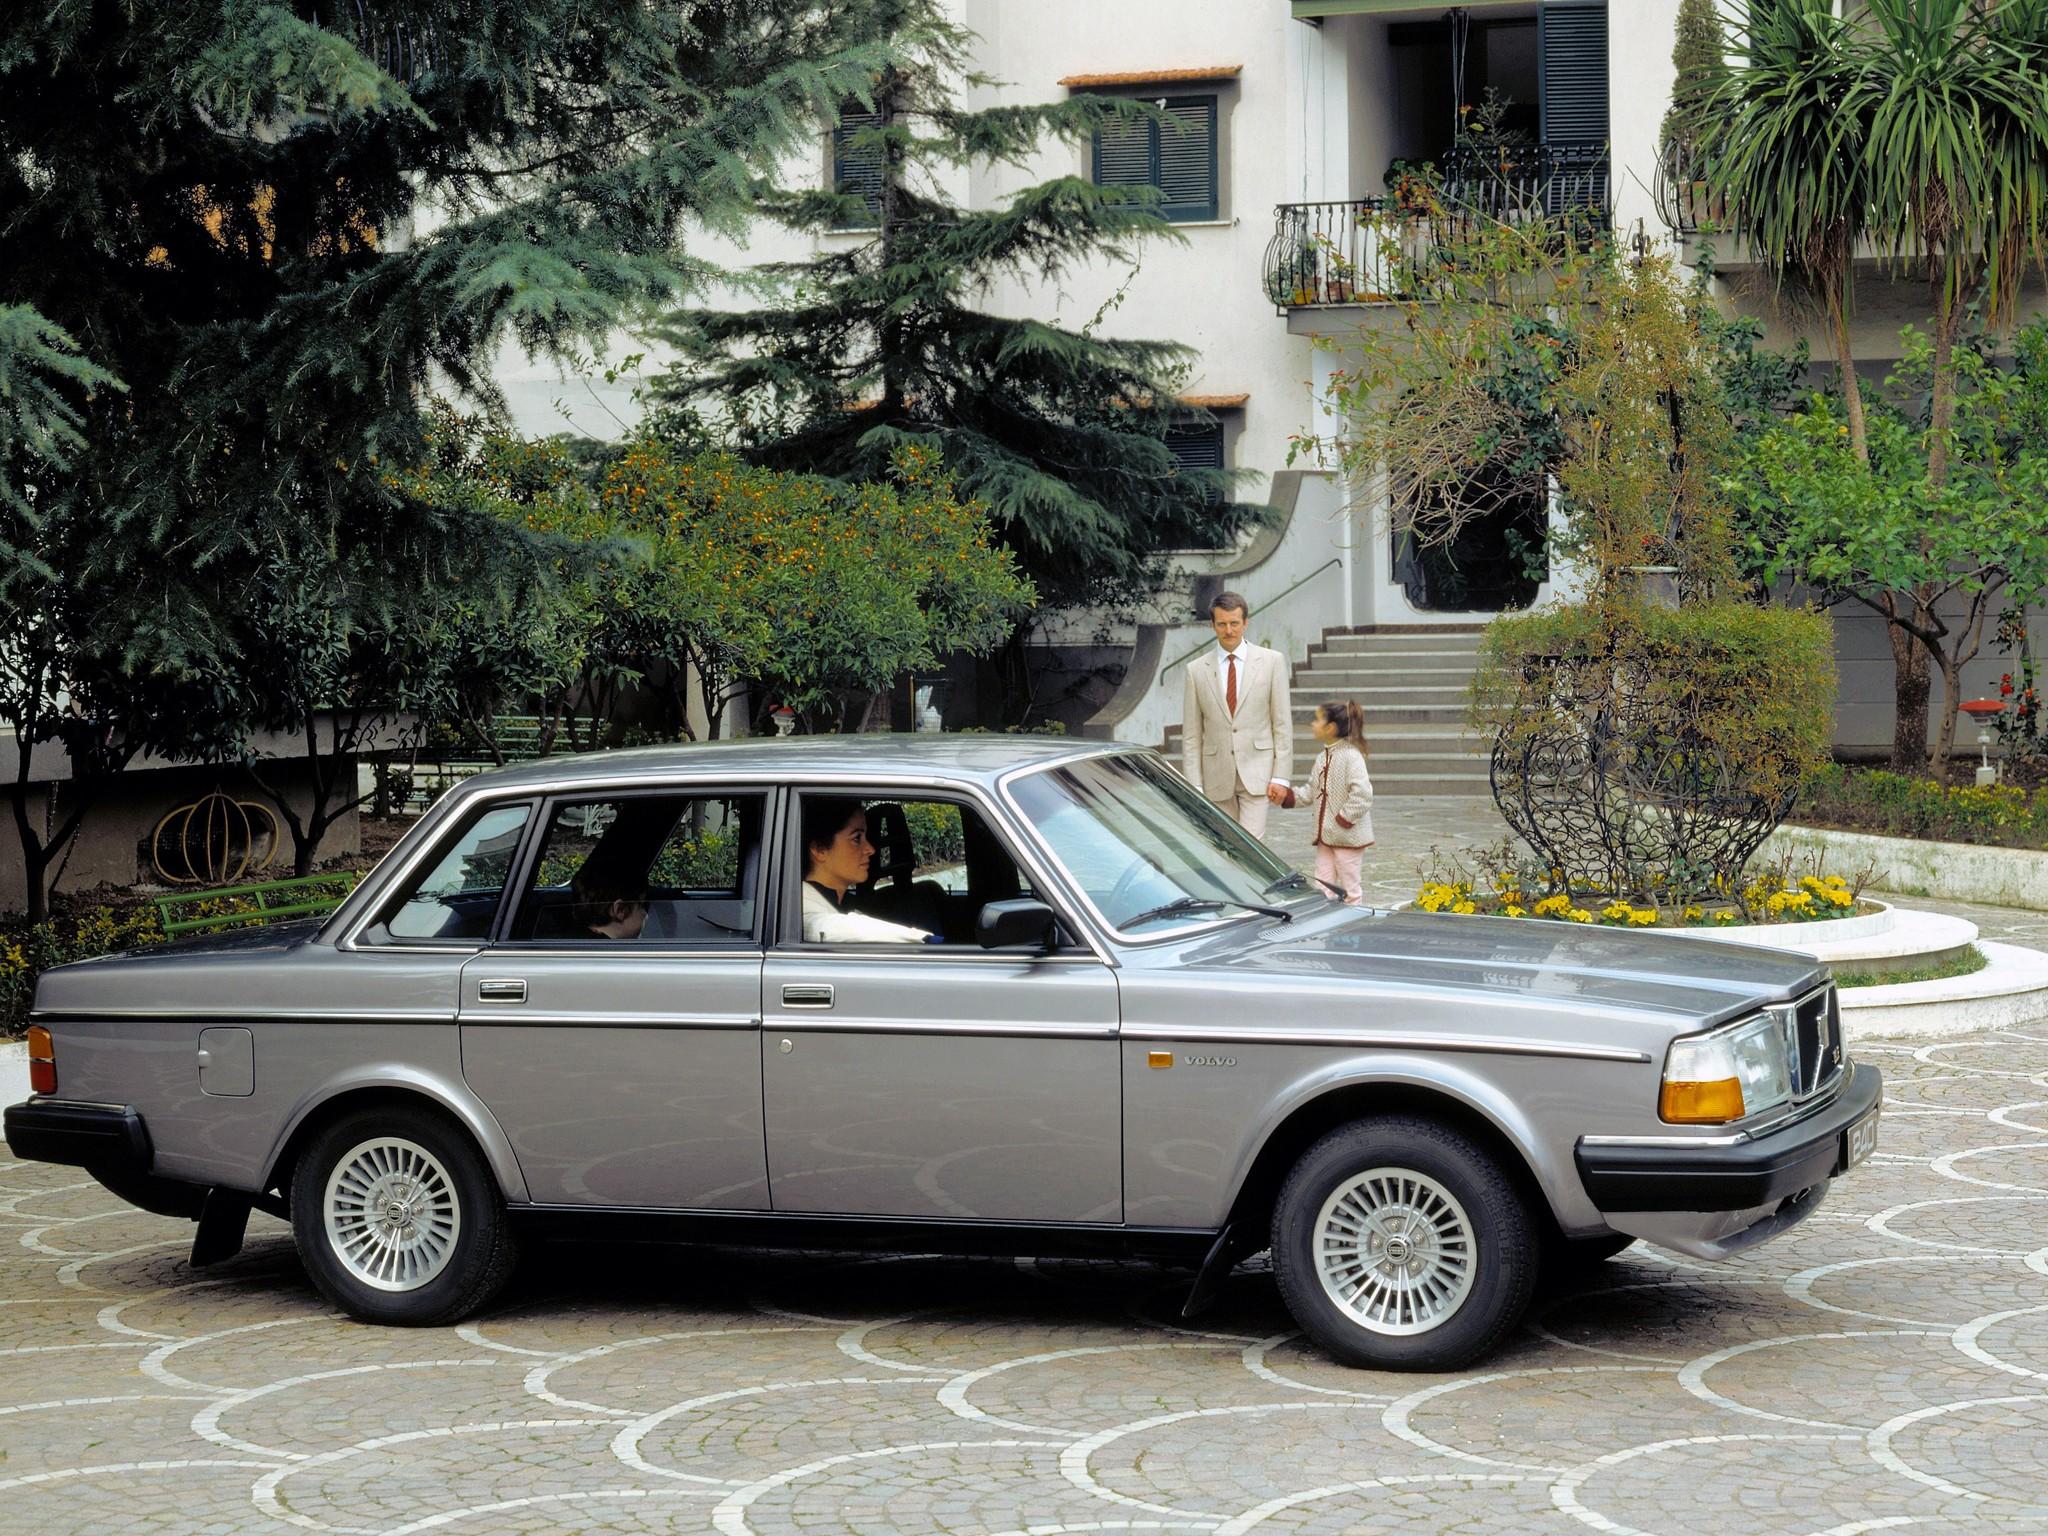 VOLVO 244 - 1975, 1976, 1977, 1978, 1979, 1980, 1981, 1982 ...